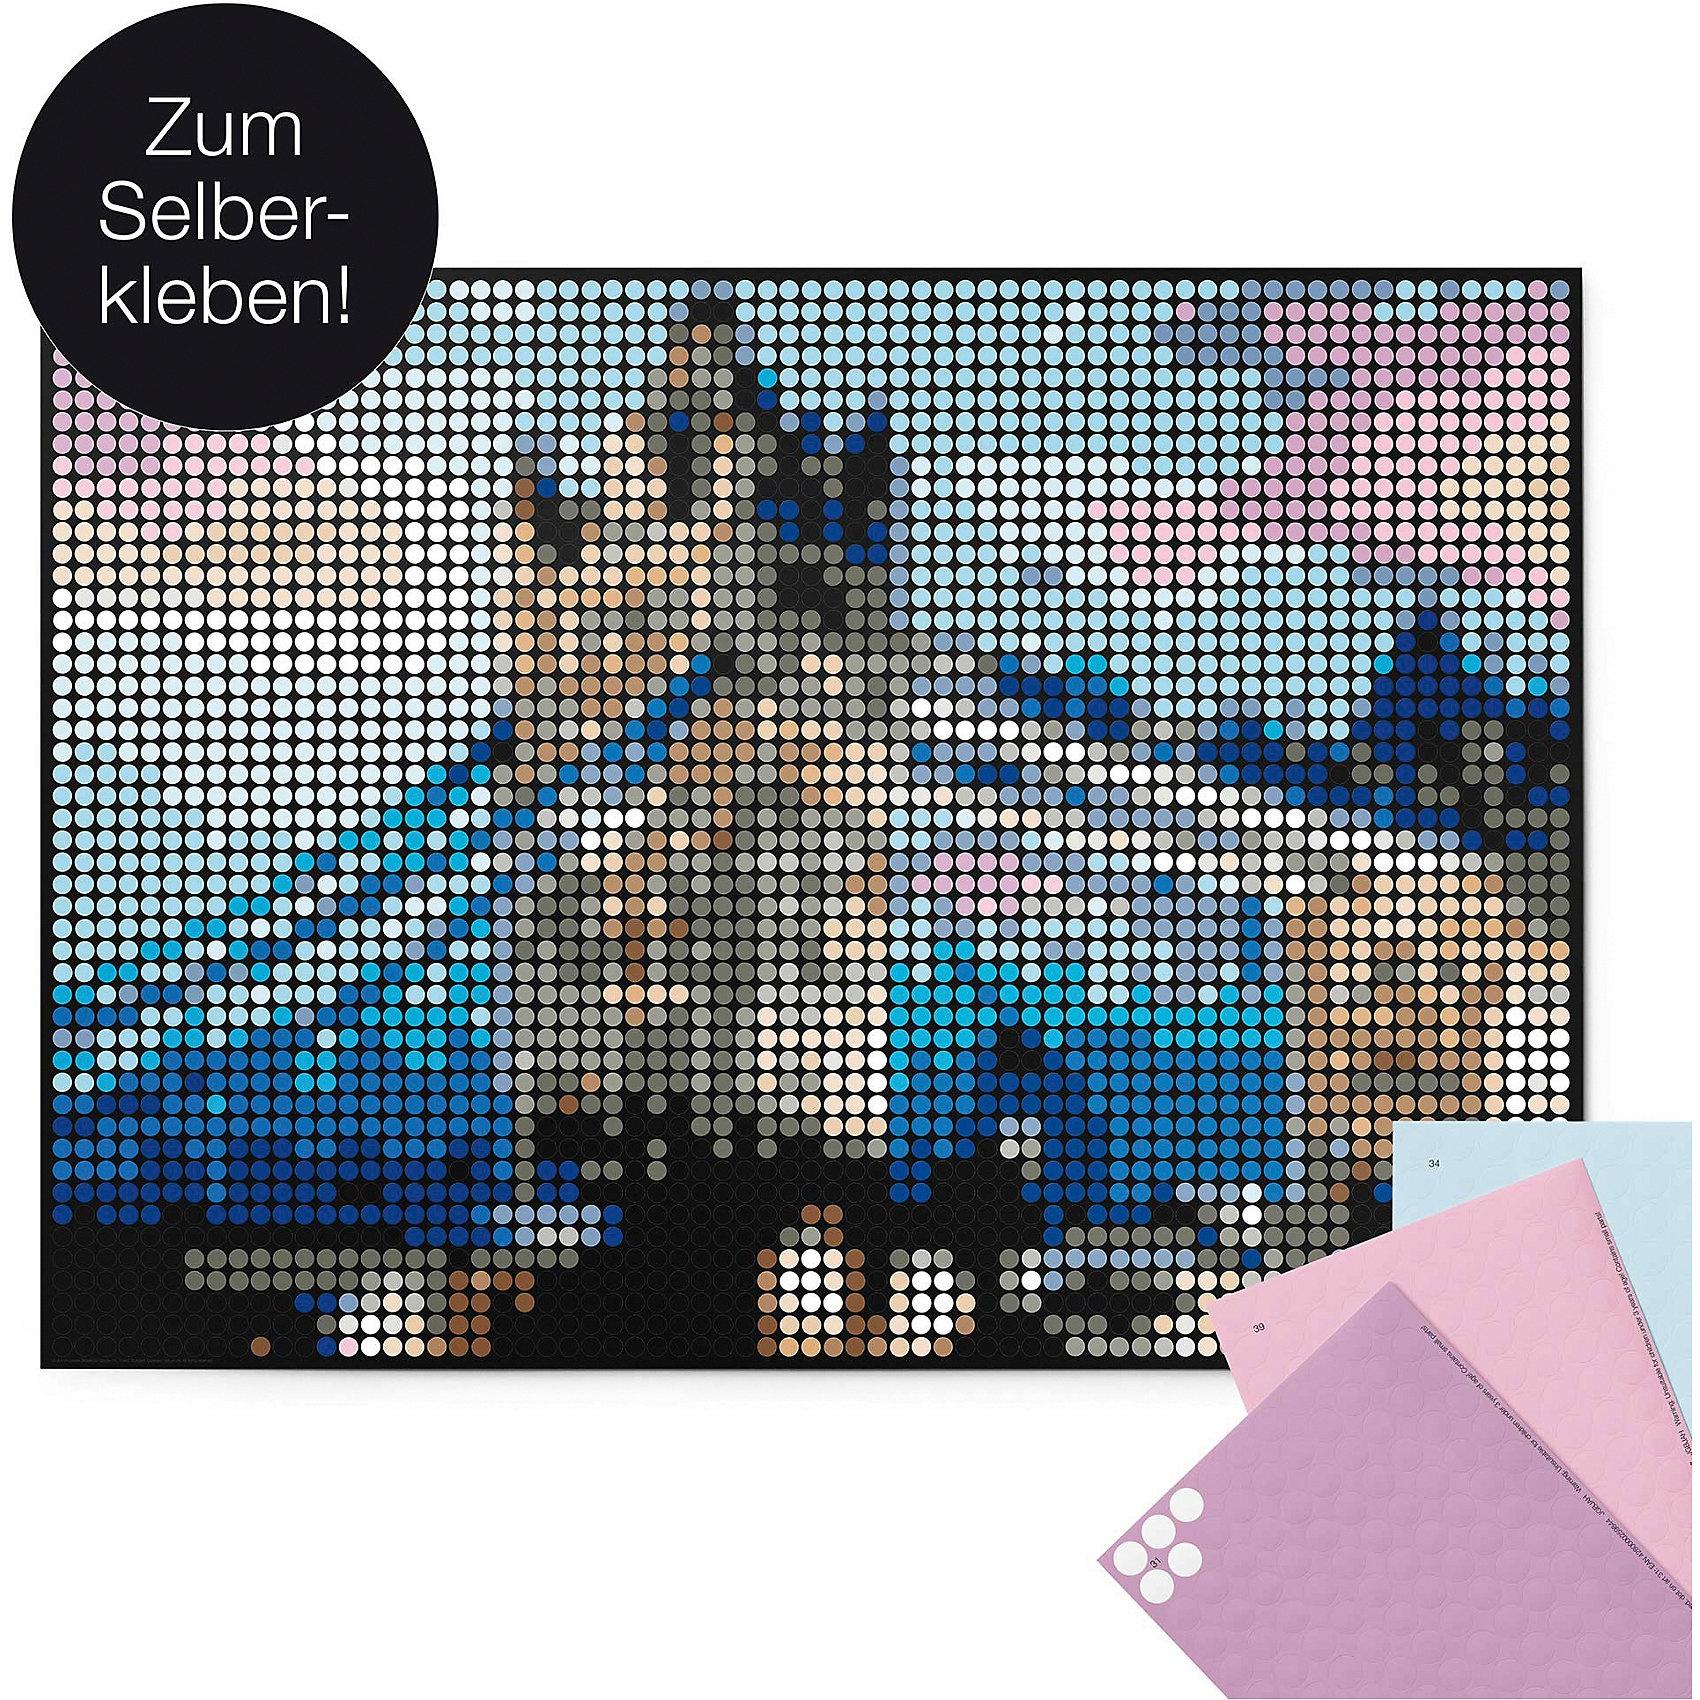 dot on art XL – tower bridge 50 x 70 cm